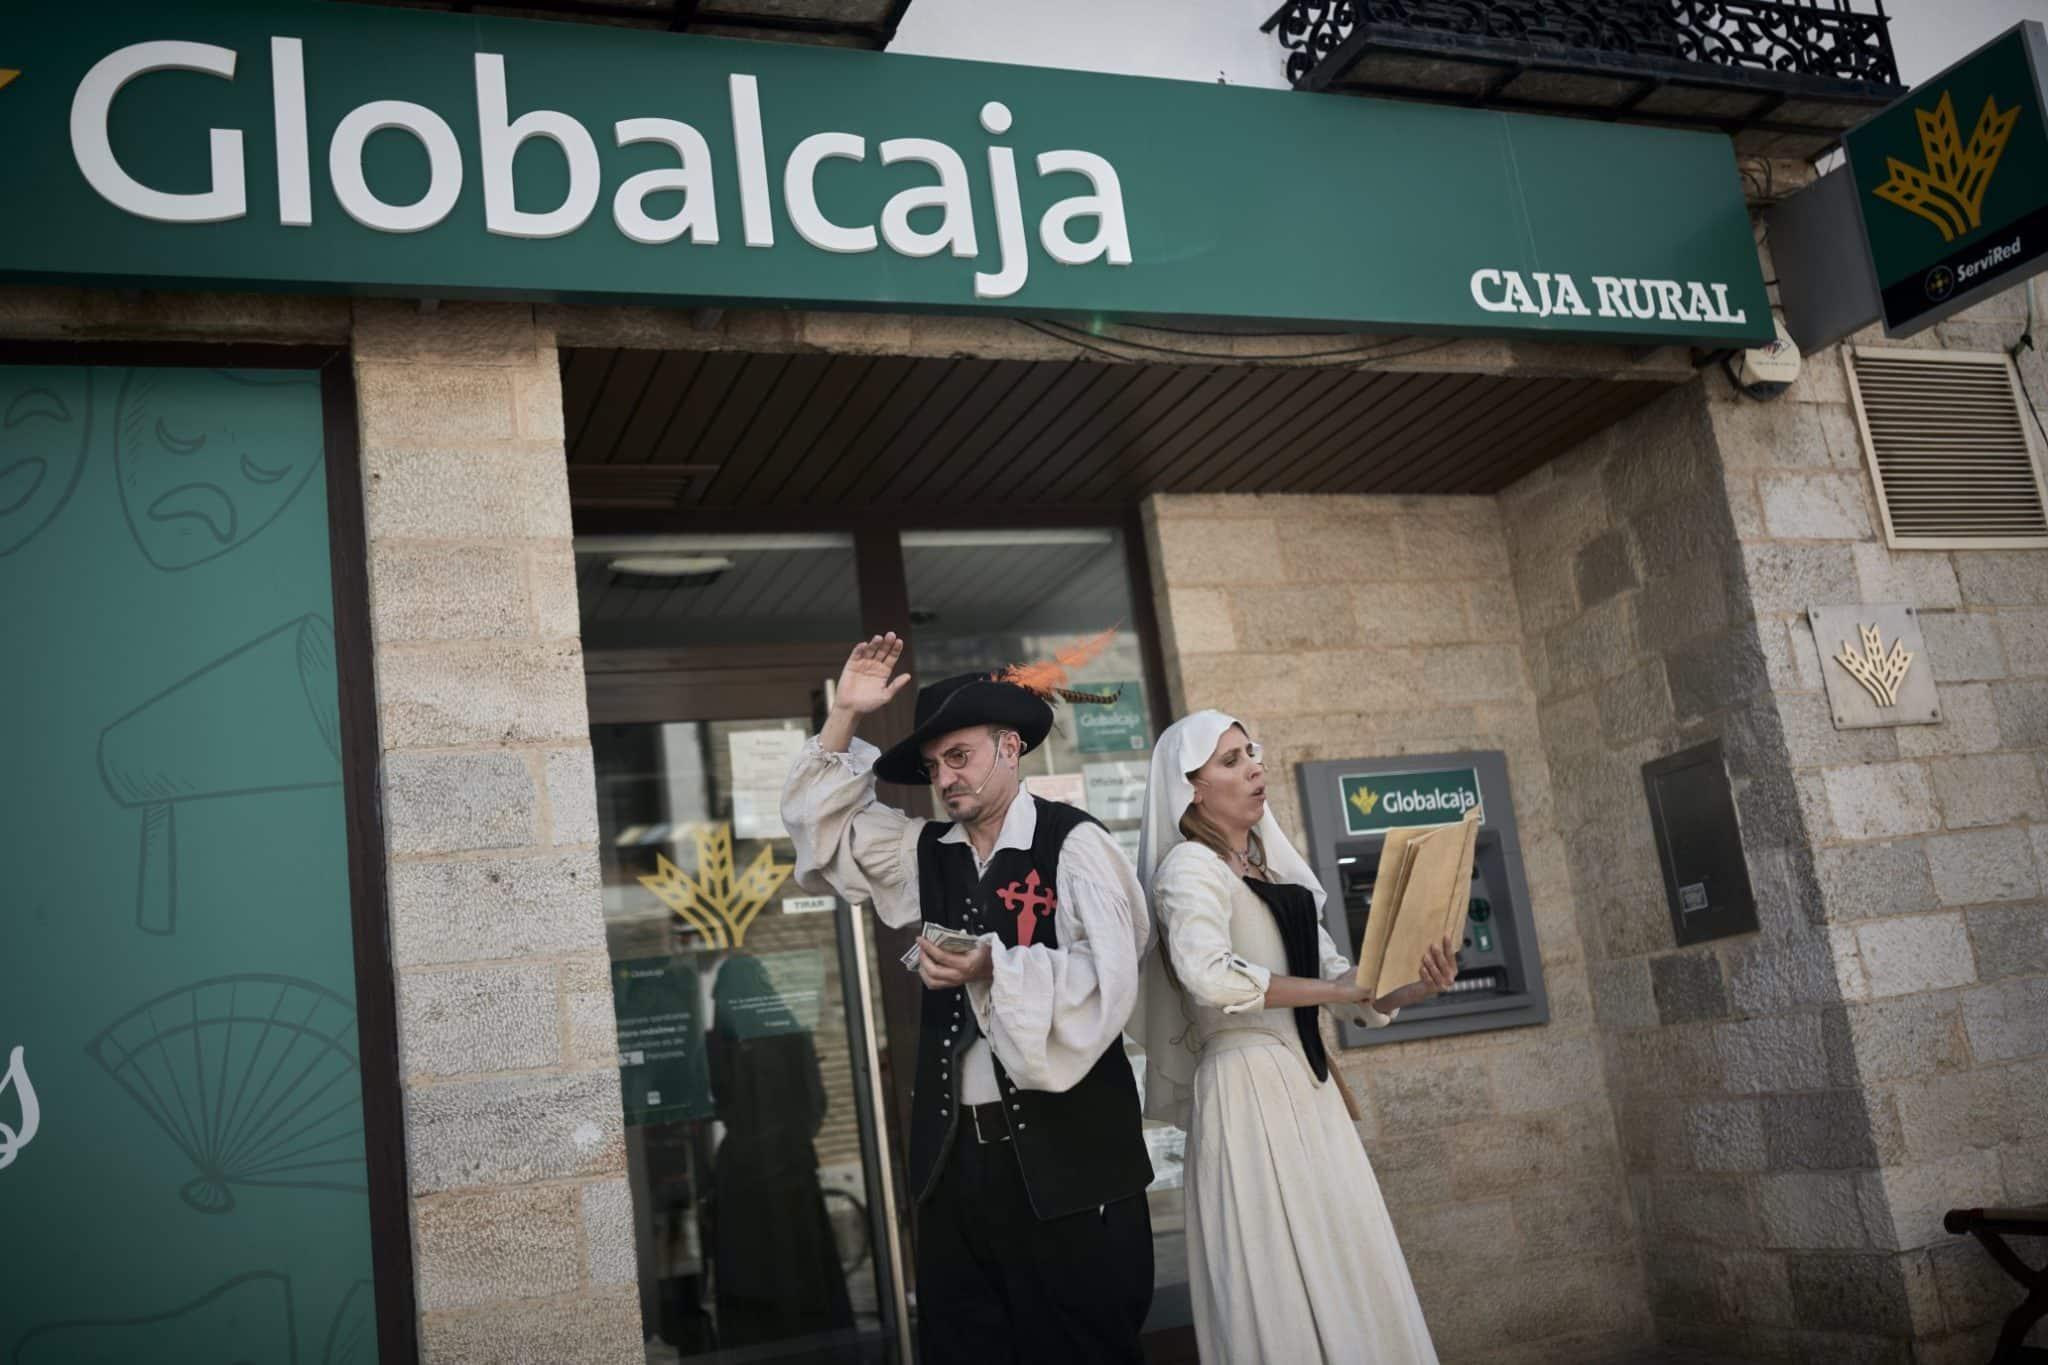 https://blog.globalcaja.es/wp-content/uploads/2020/07/EczywEFWsAAJ7I-.jpg